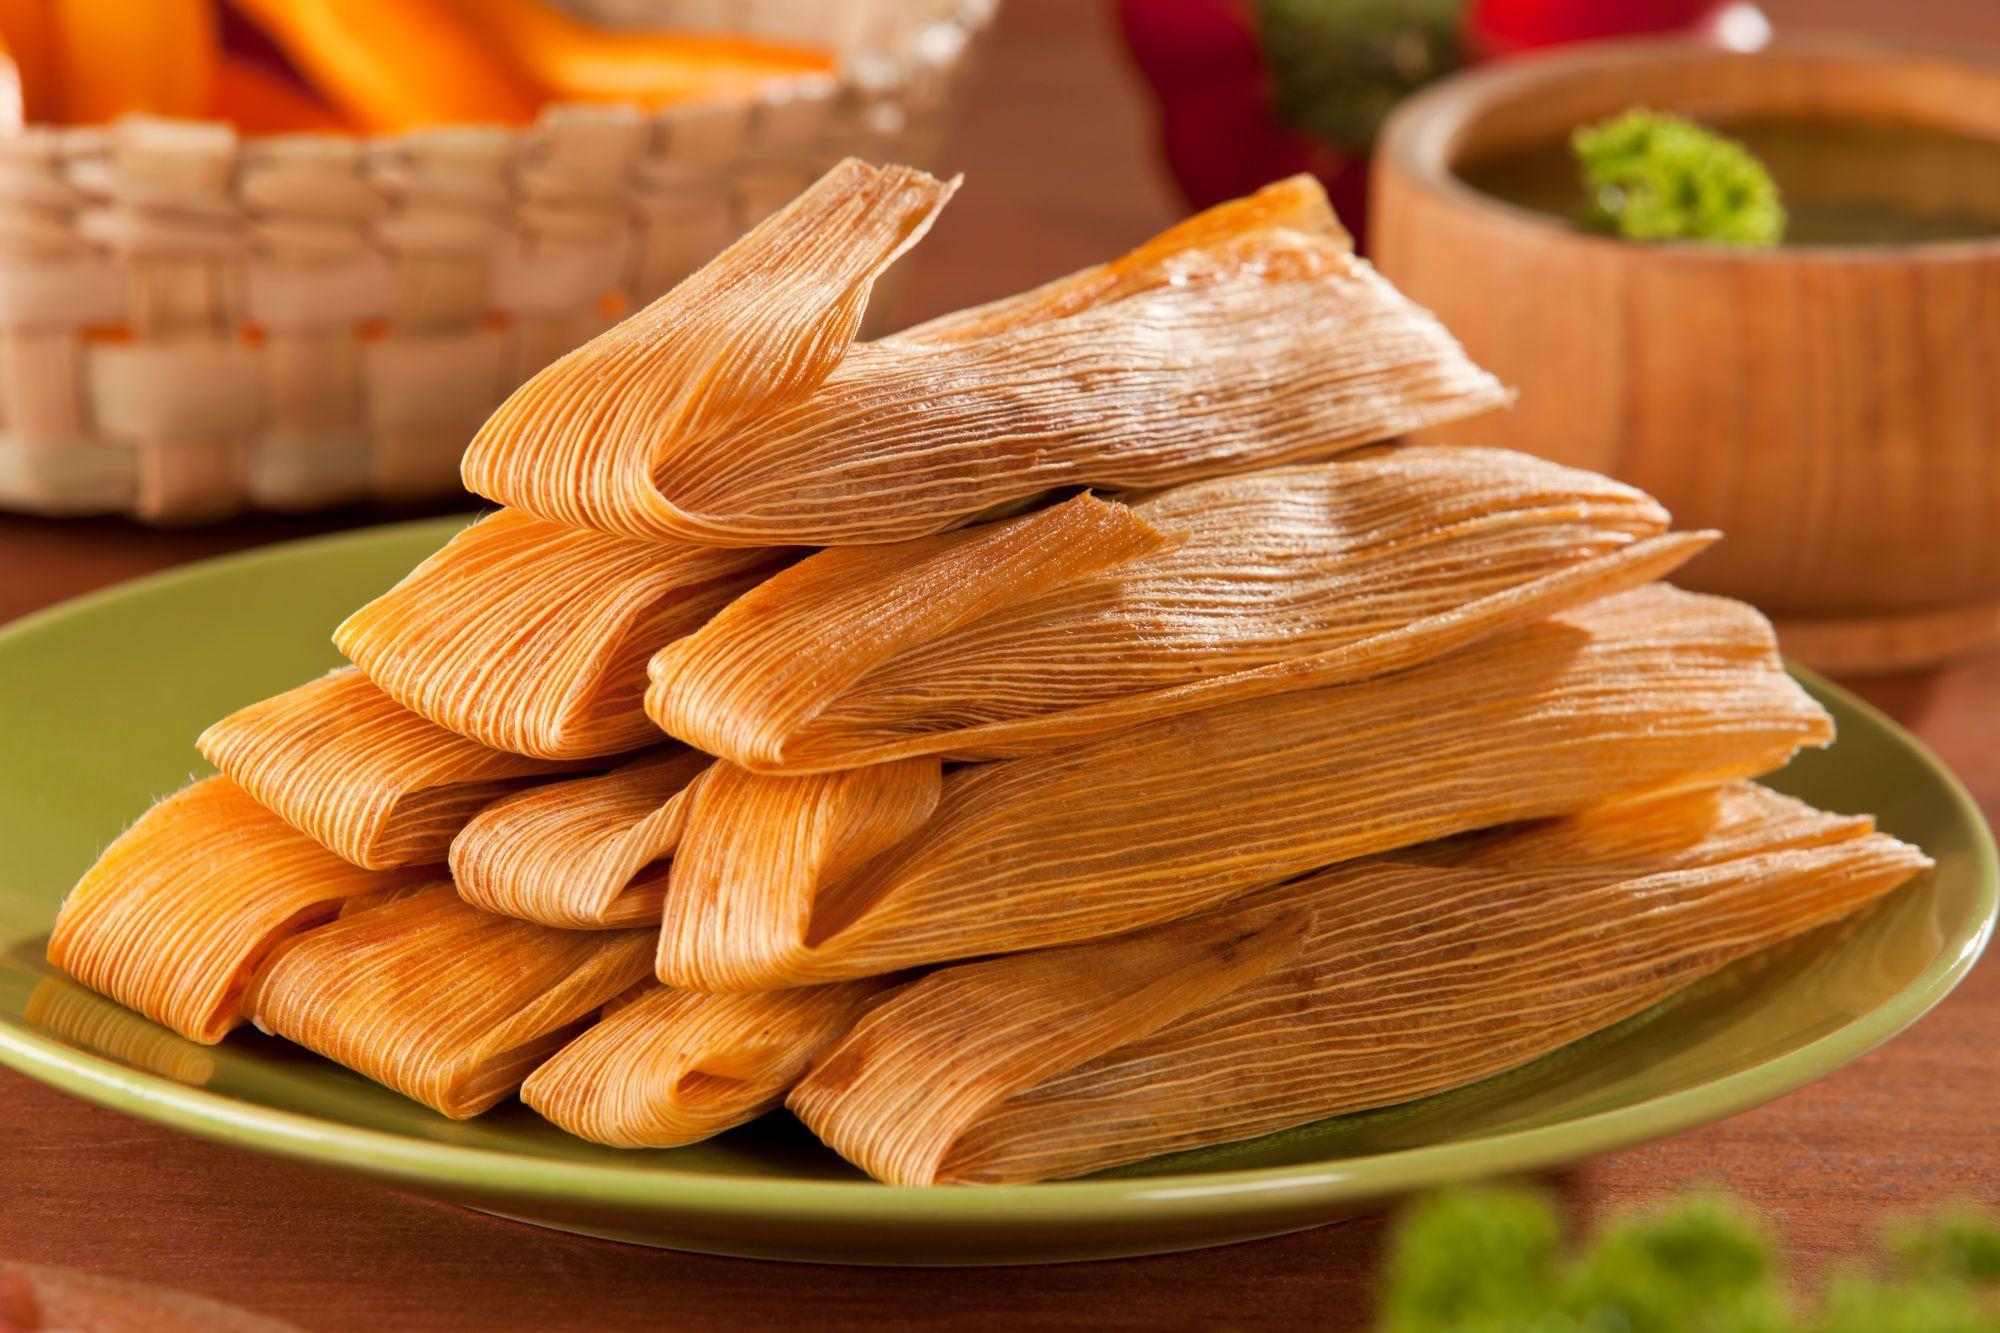 Corngreen chilecheese tamales recipe pork tamales